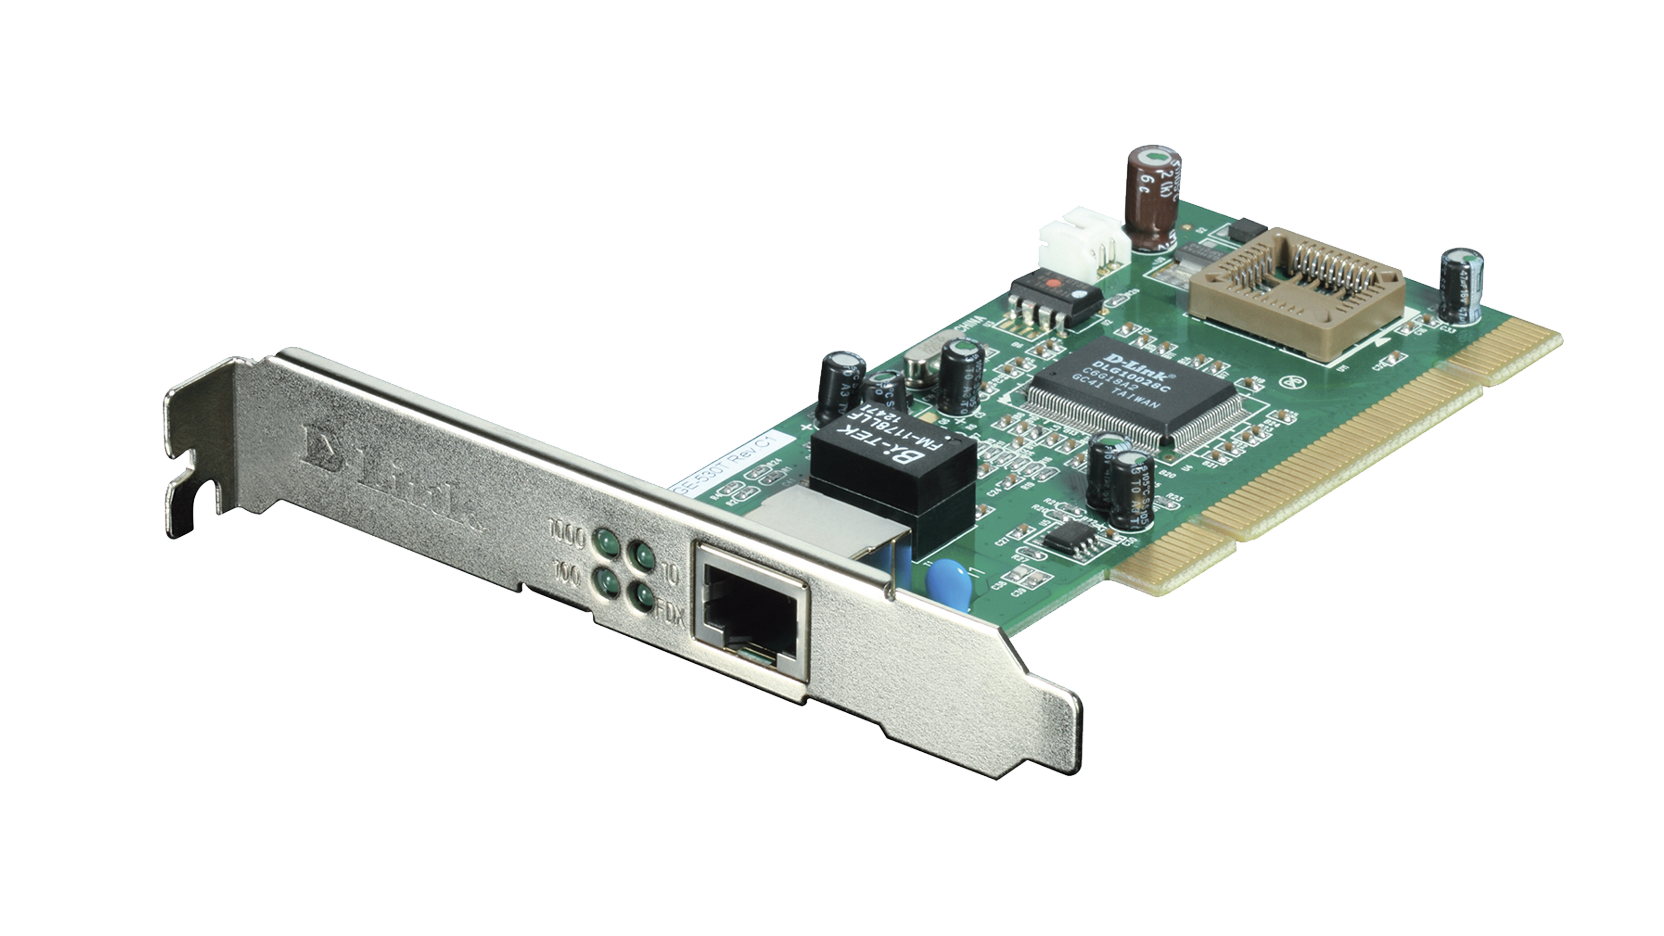 Dge 560t Pci Express Gigabit Ethernet Adapterd Link